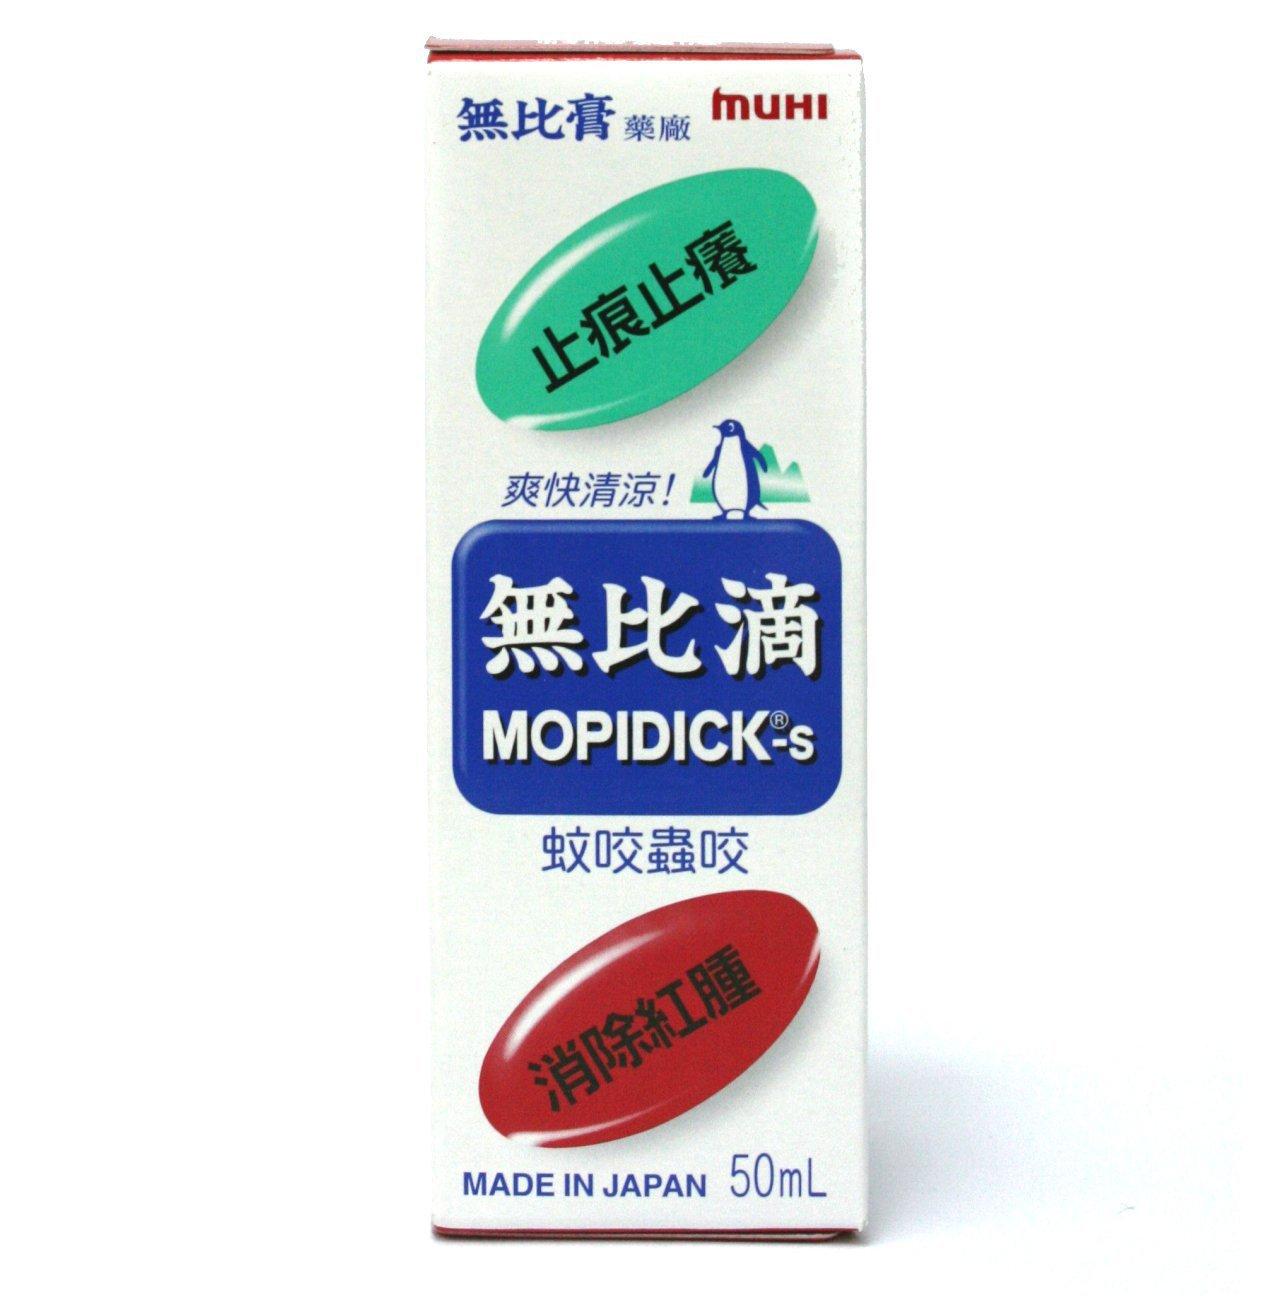 MUHI Mopidick-s Lotion 50ml ��滴